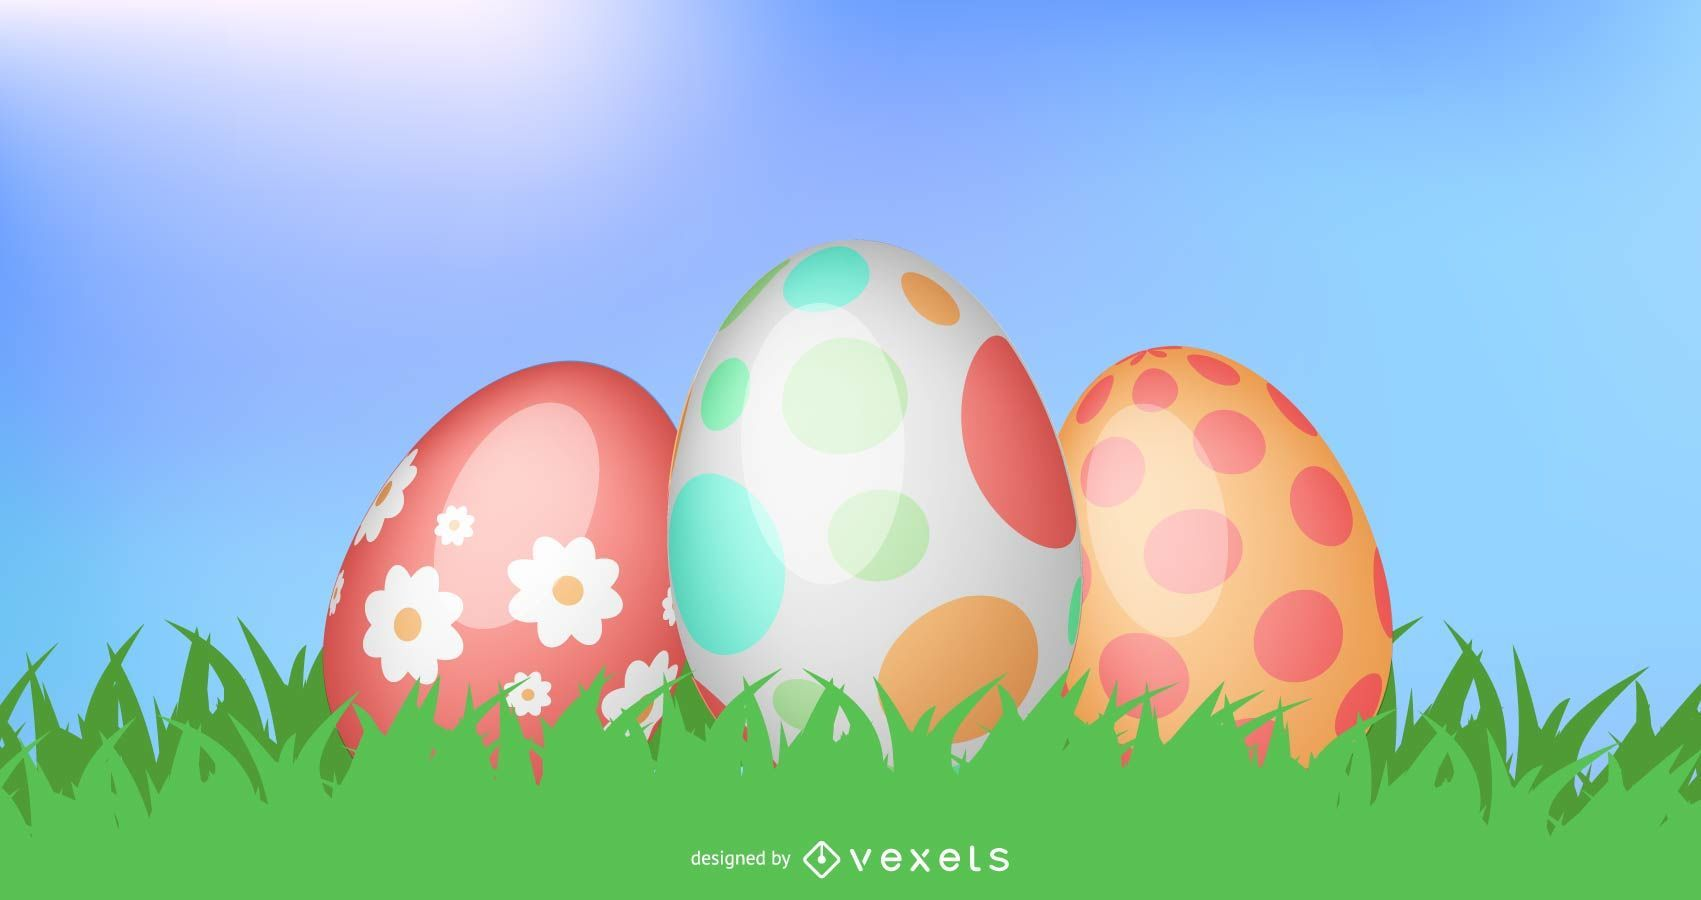 3 Easter Eggs on Green Grass